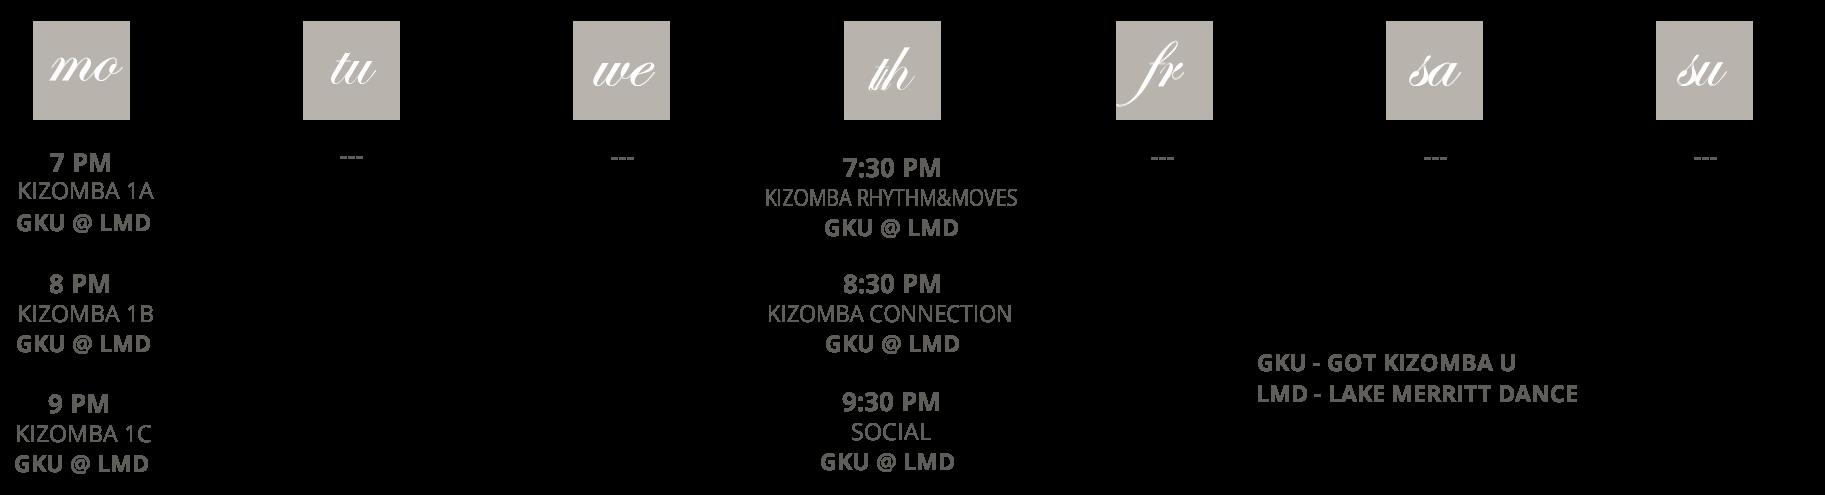 Got Kizomba U schedule at a glance